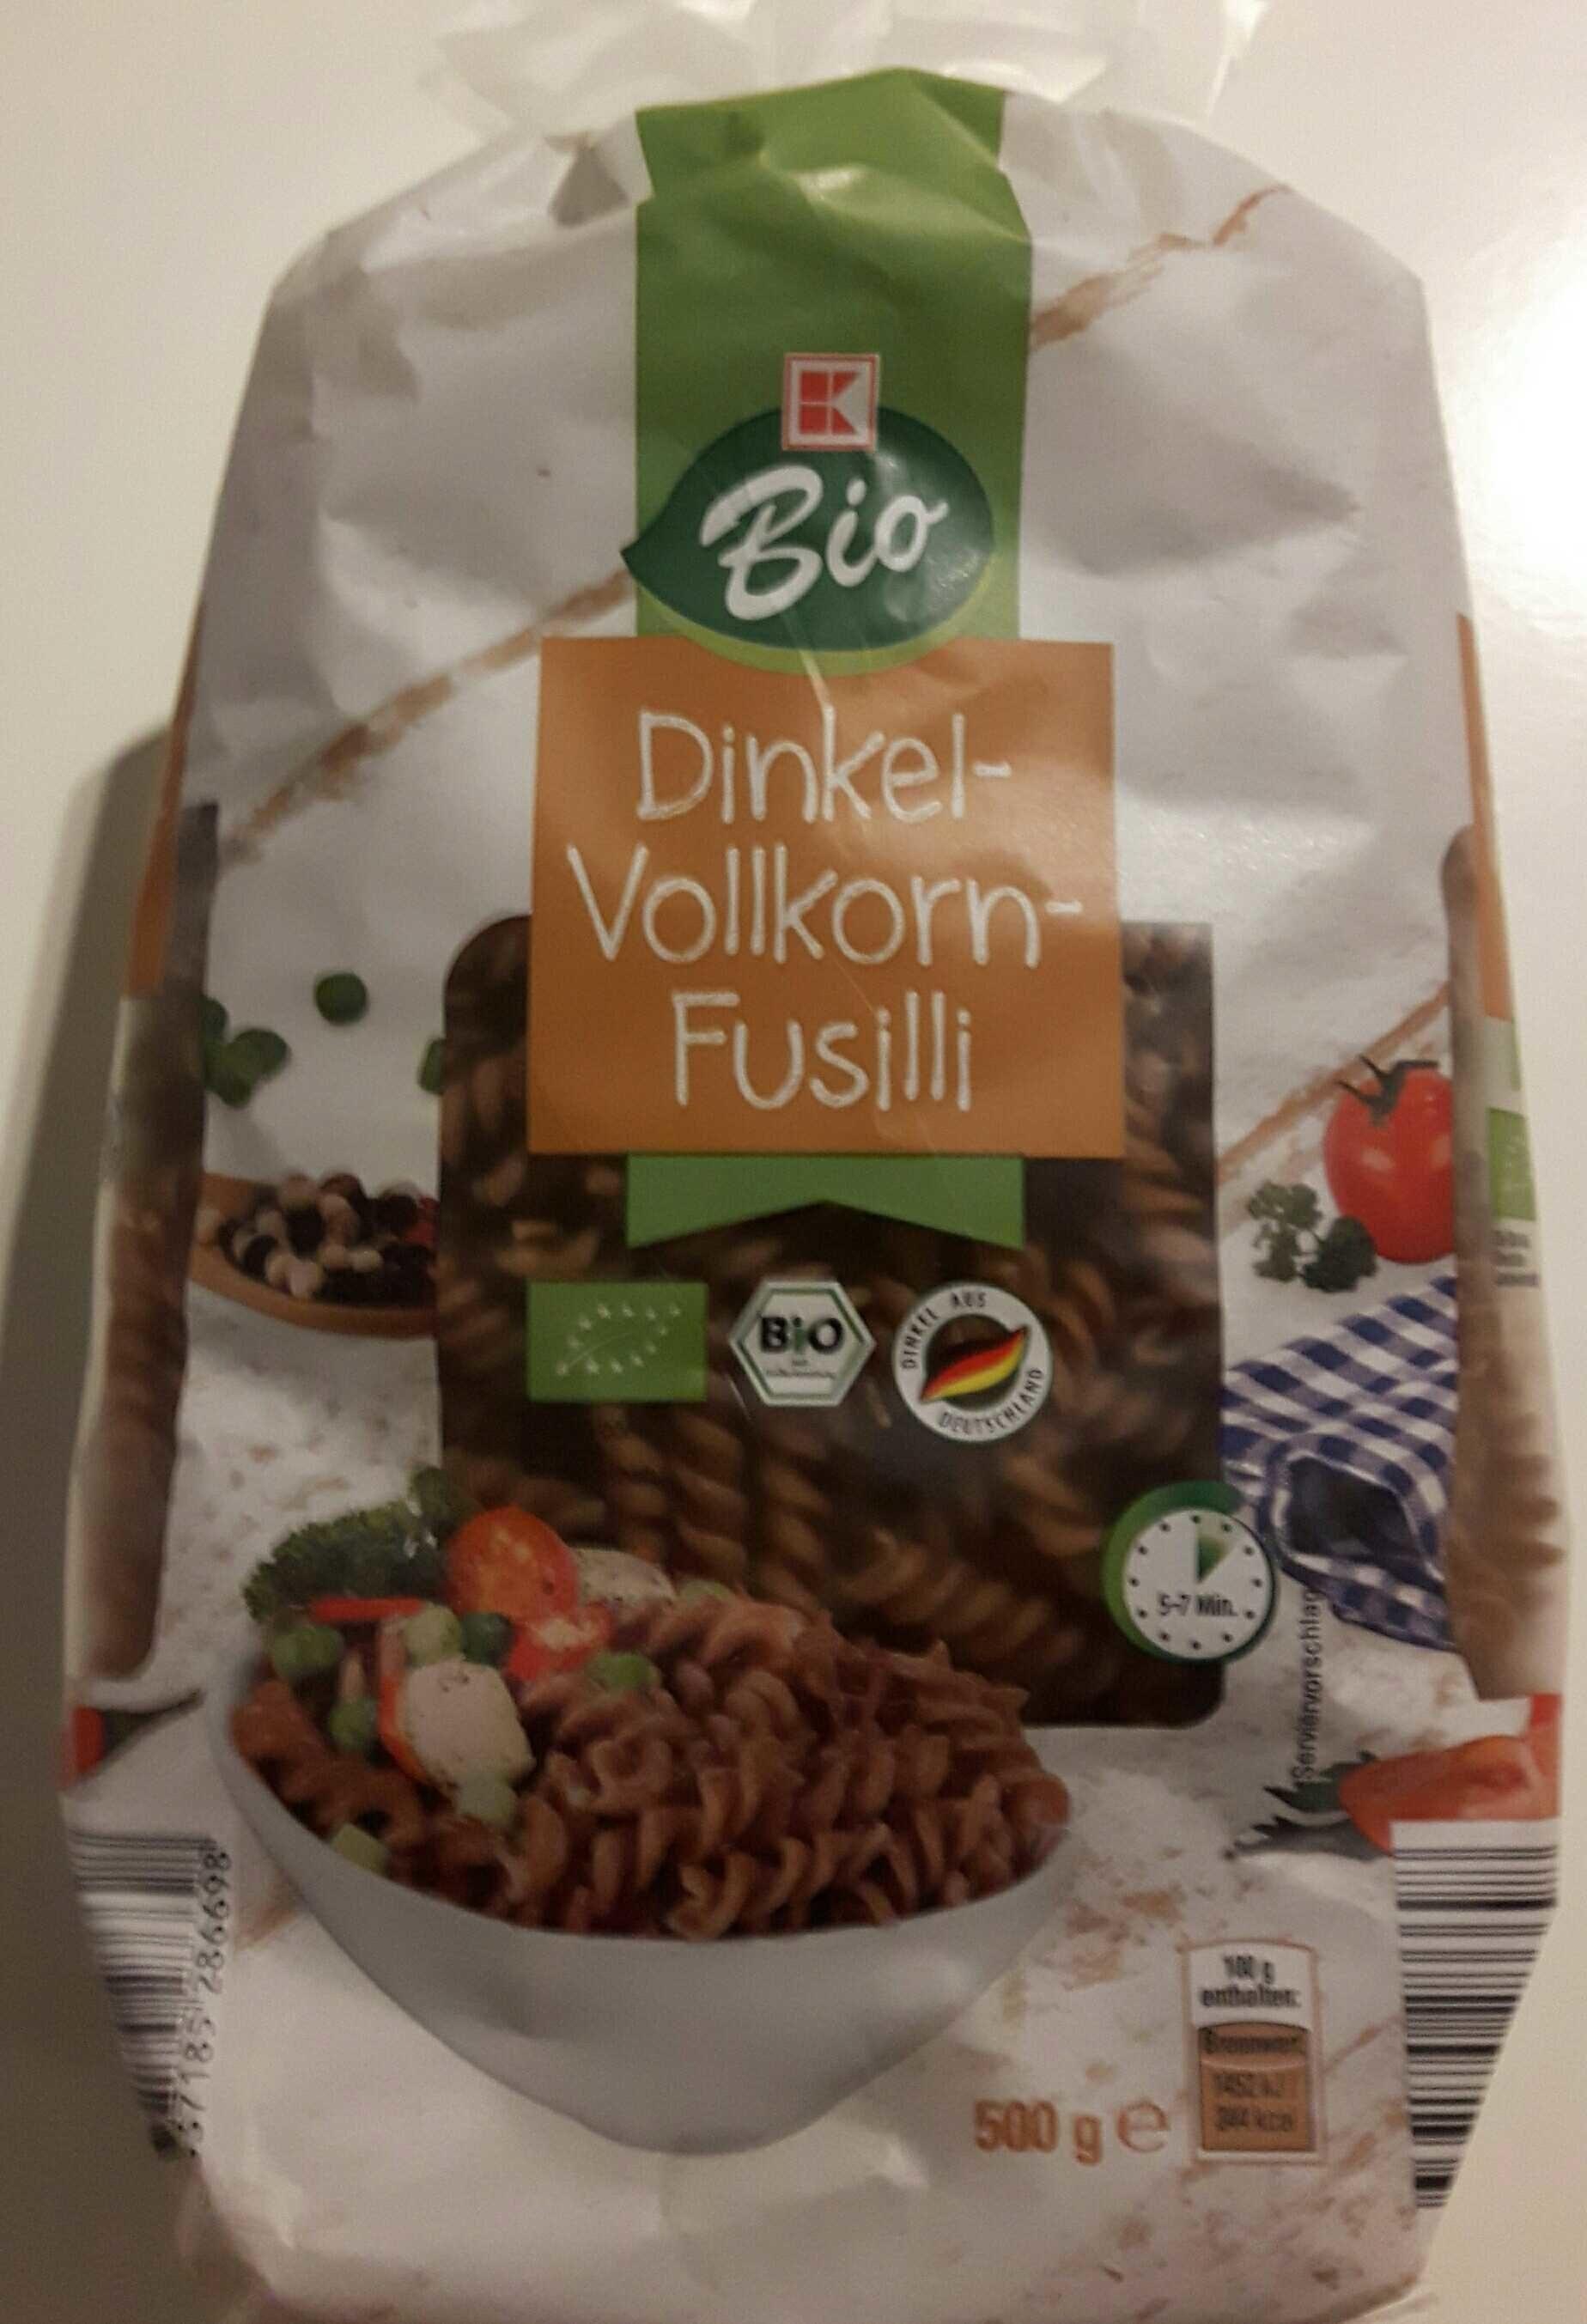 Dinkel-Vollkorn-Fusilli - Product